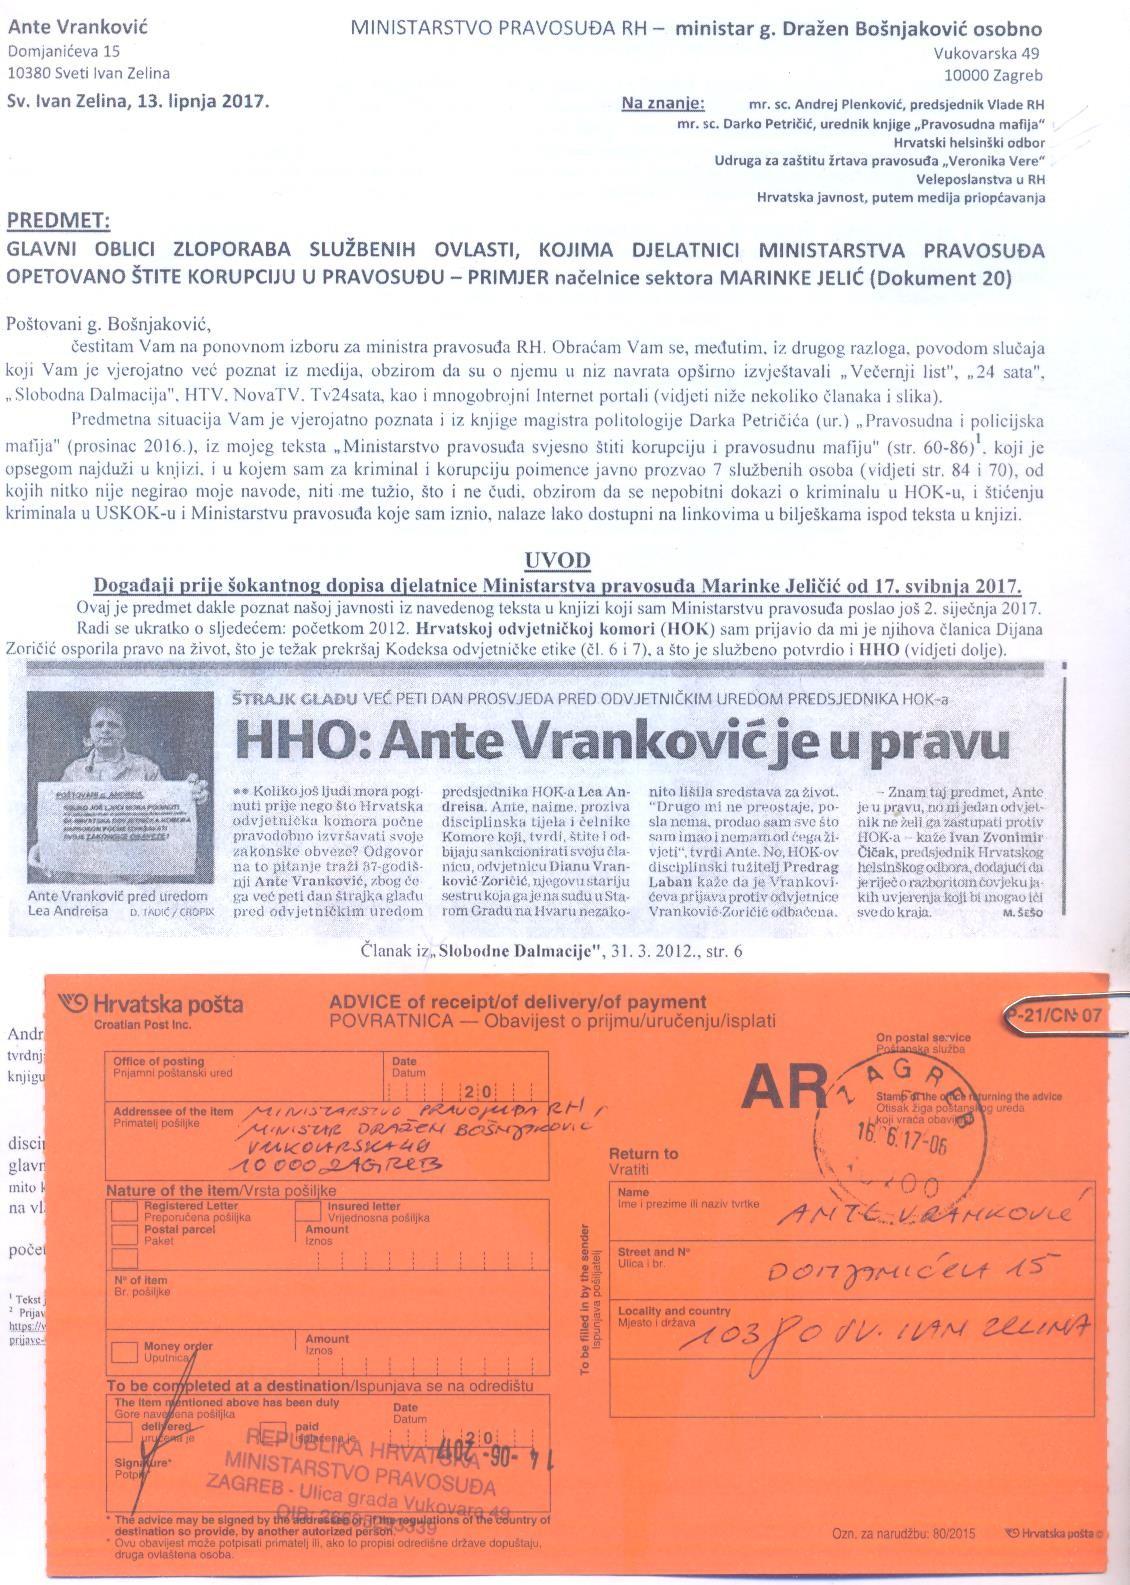 Vranković - Prilog 3